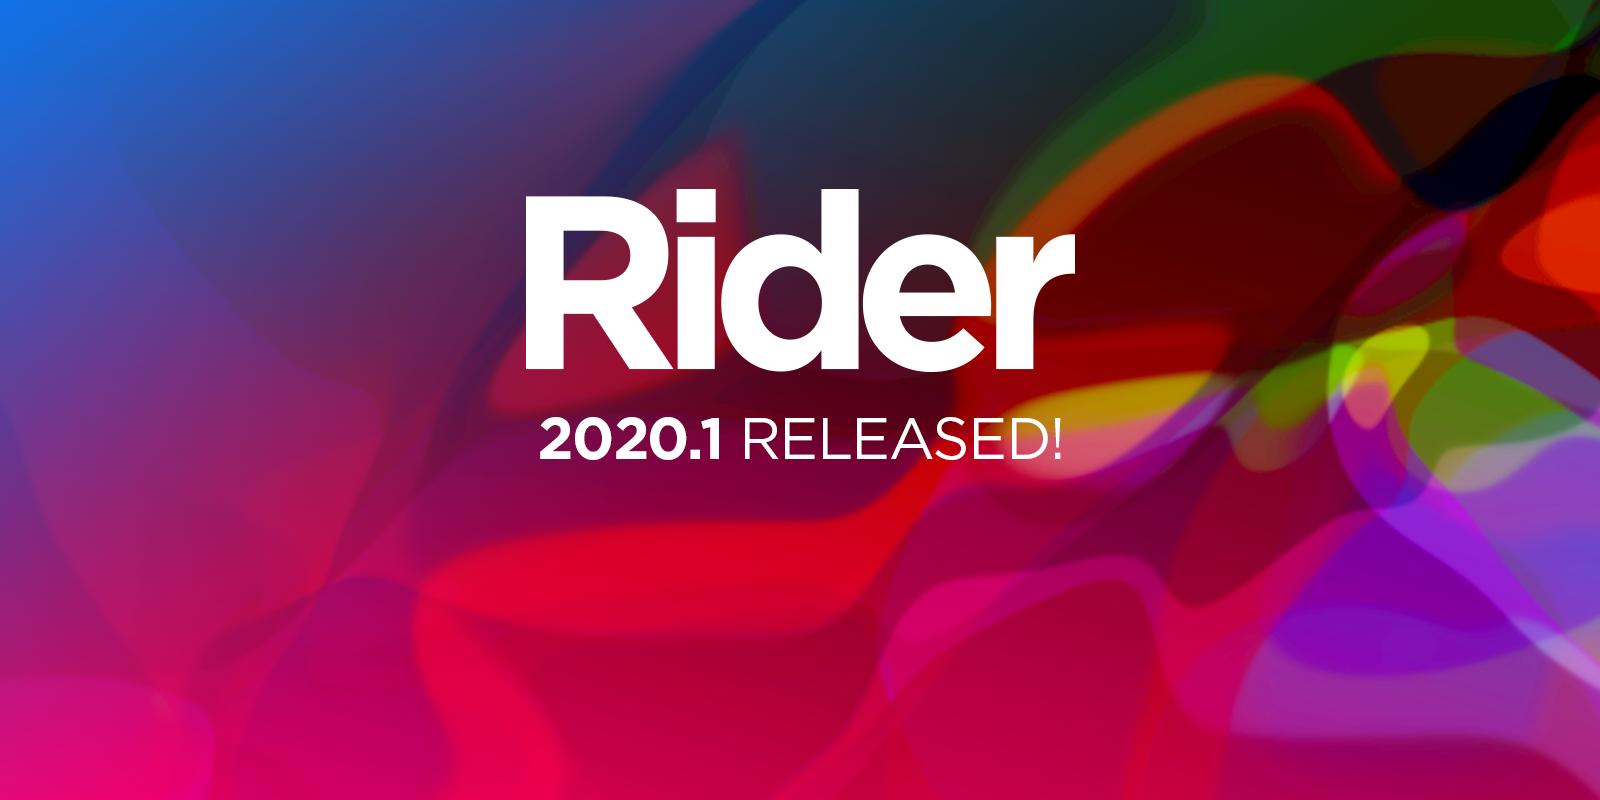 Rider 2020.1 est disponible